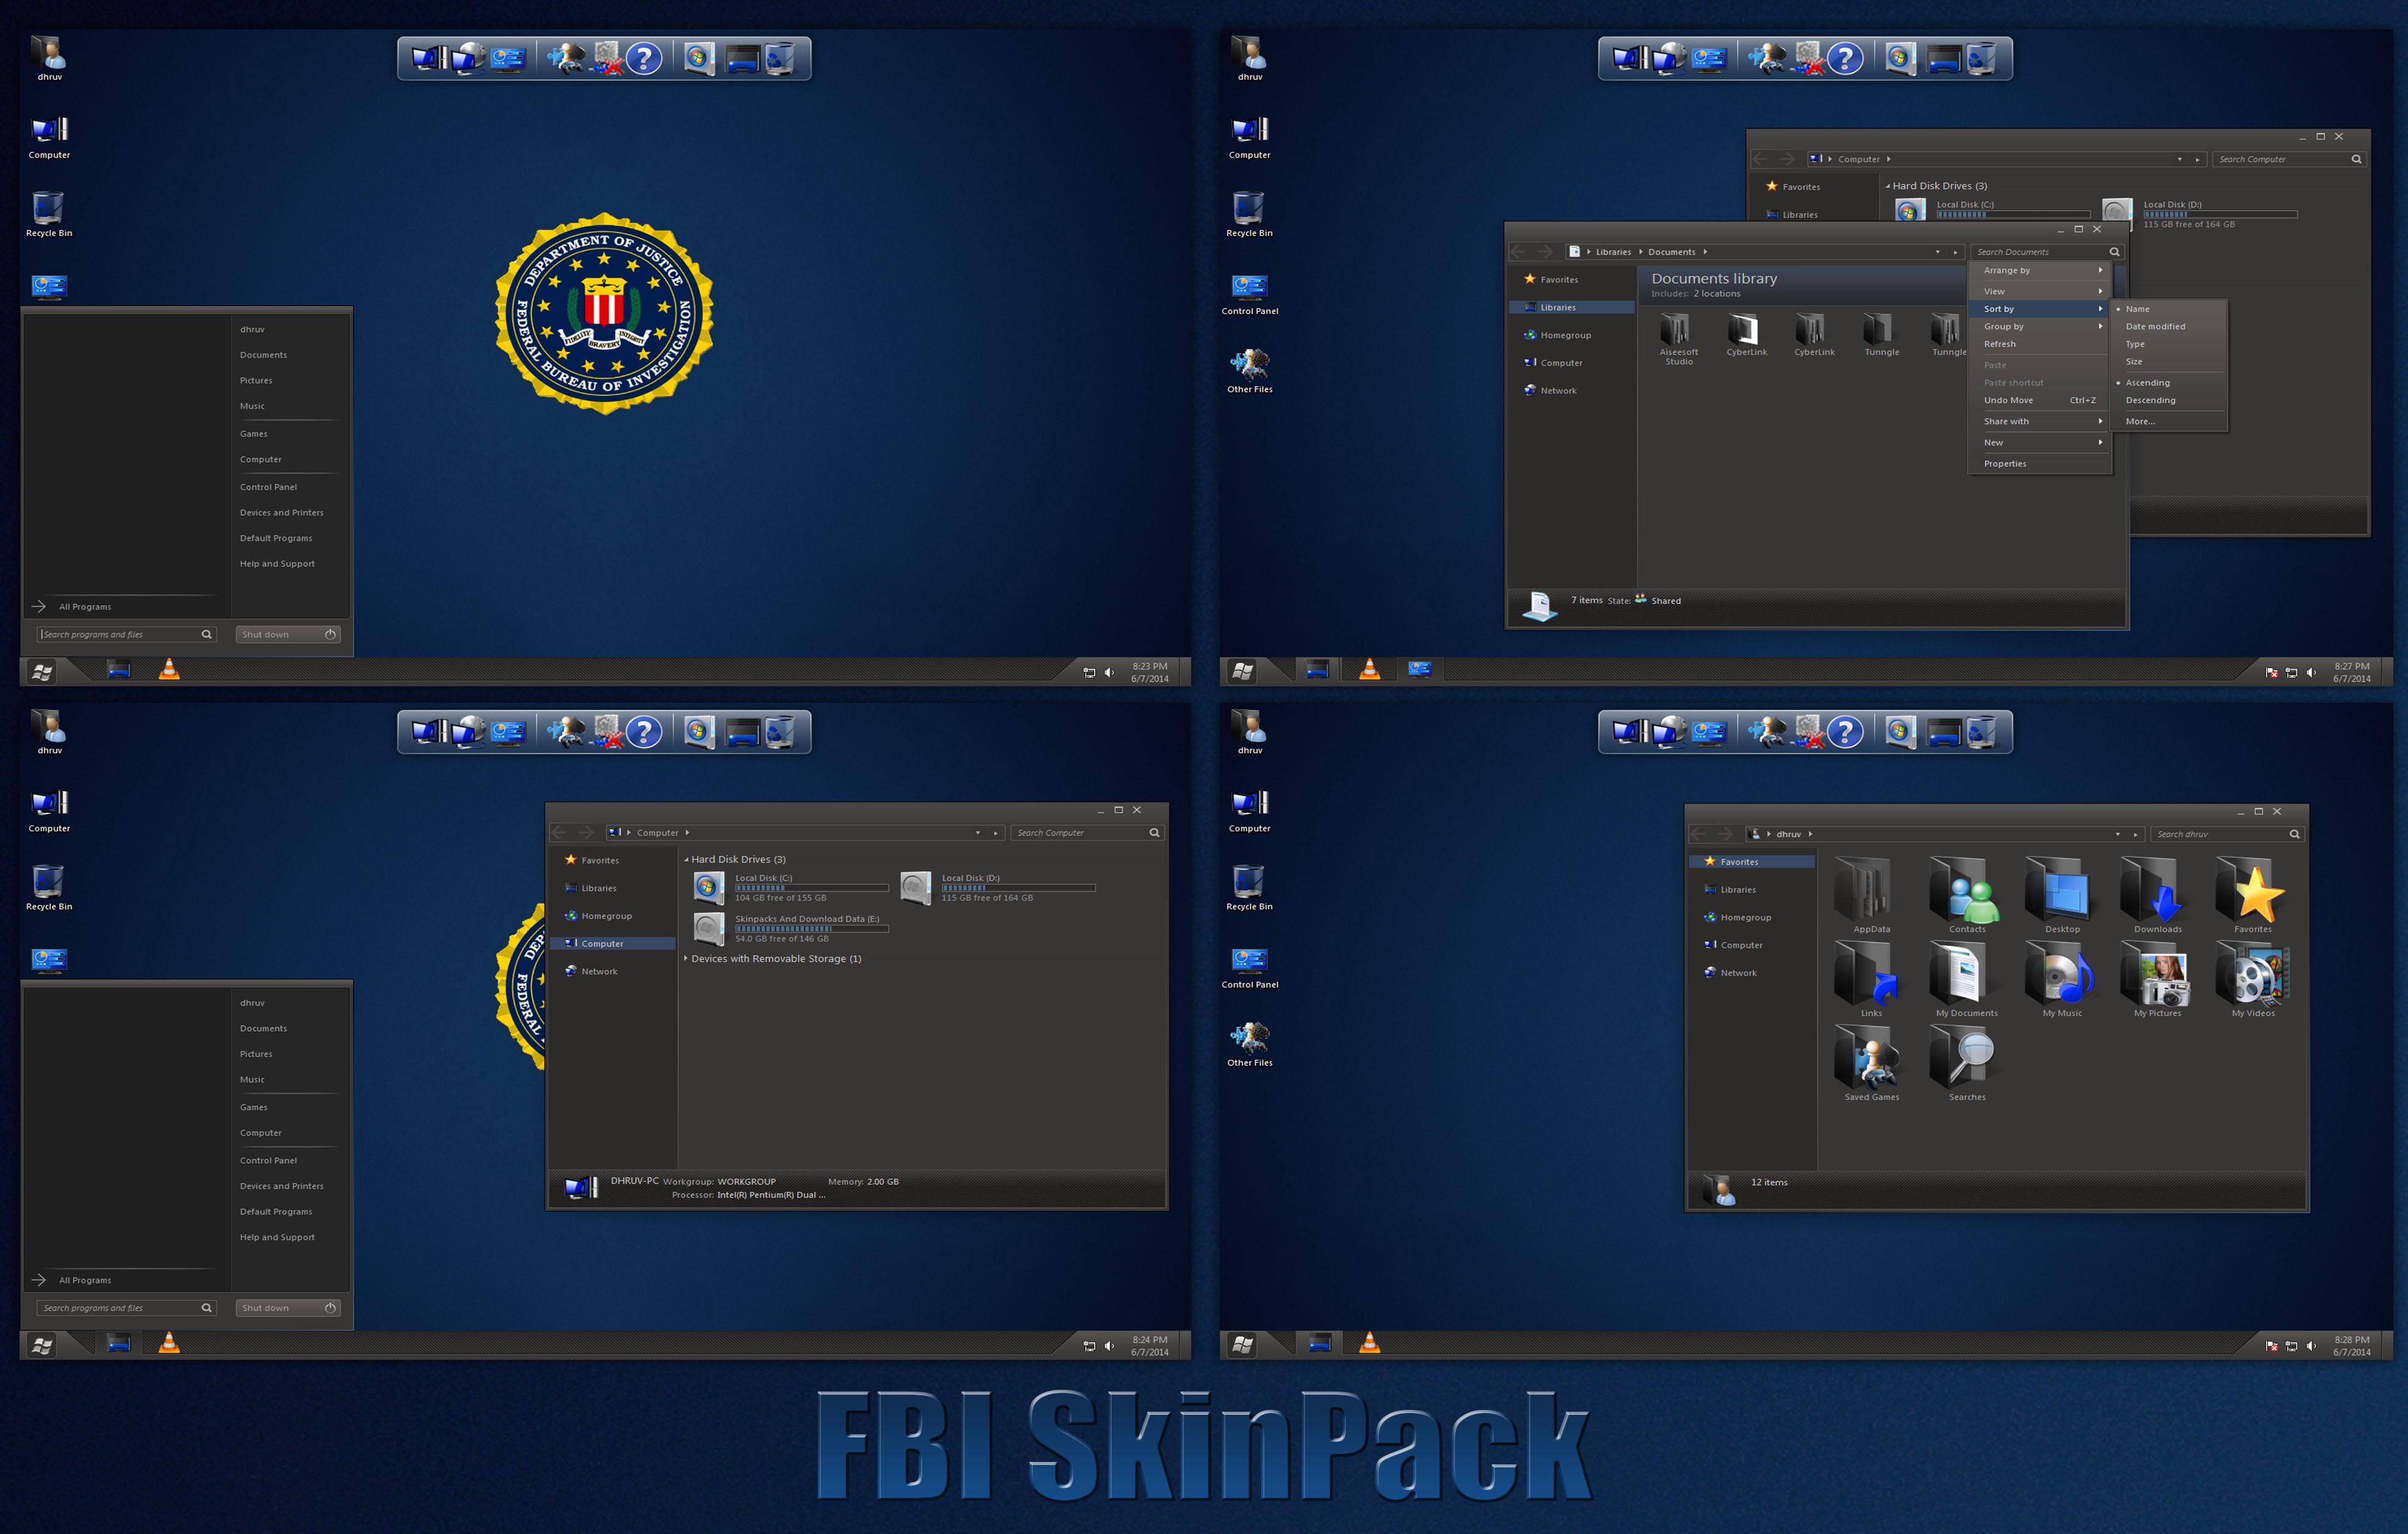 fbi skinpack for windows 7881 by thedhruv on deviantart